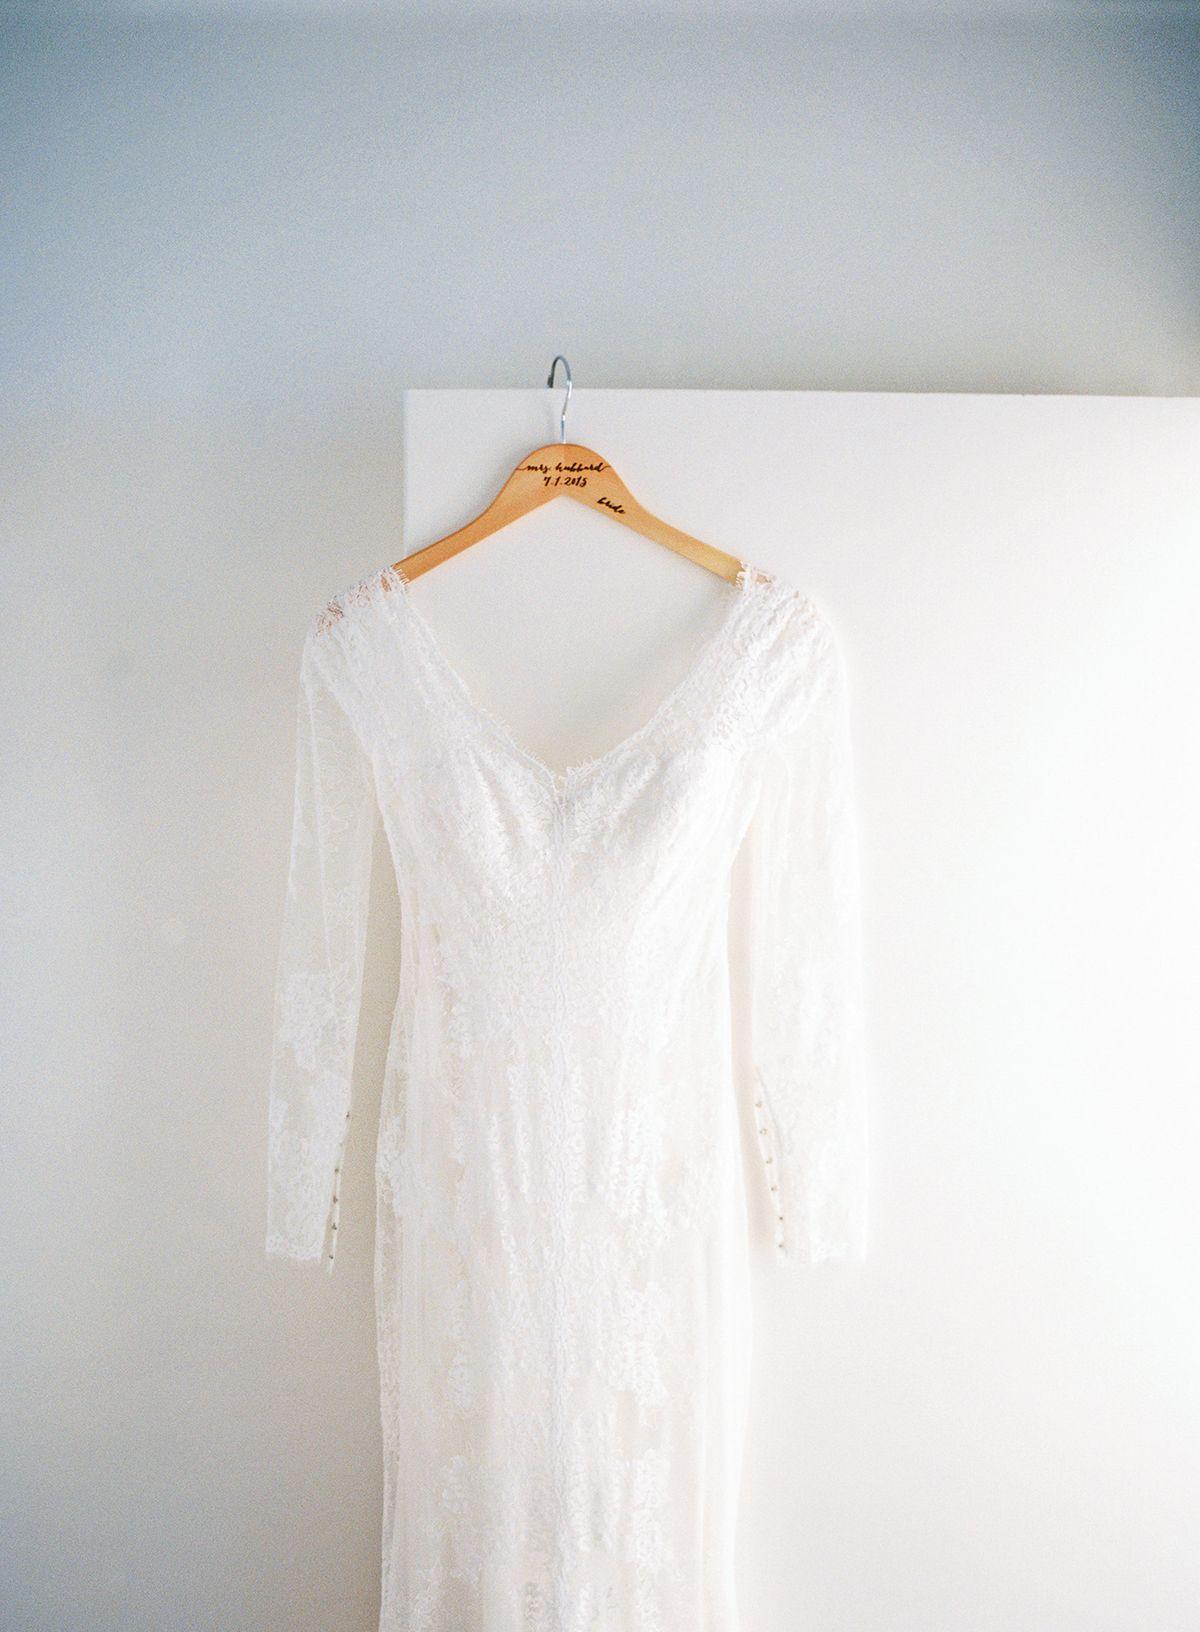 White and ivory rustic chic wedding in idaho elegant wedding dress